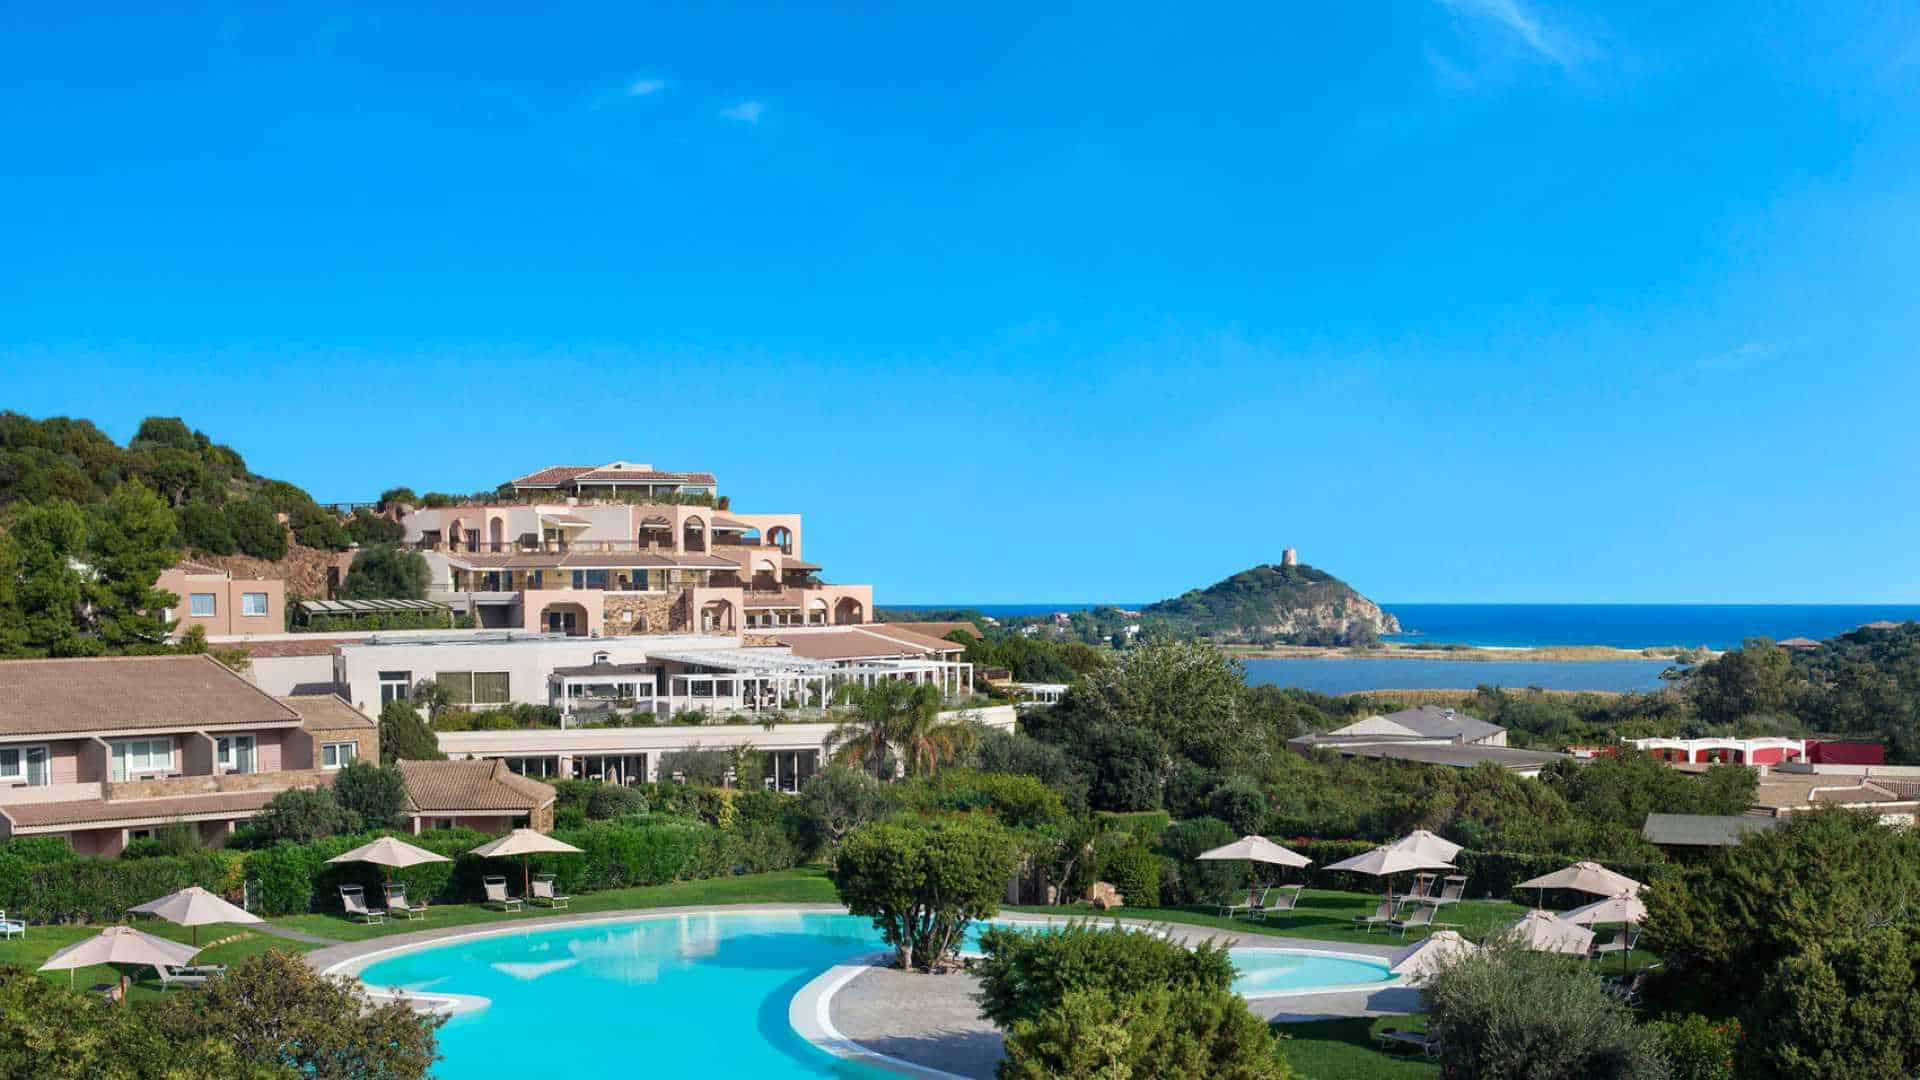 Chia Laguna Resort, Sardinia